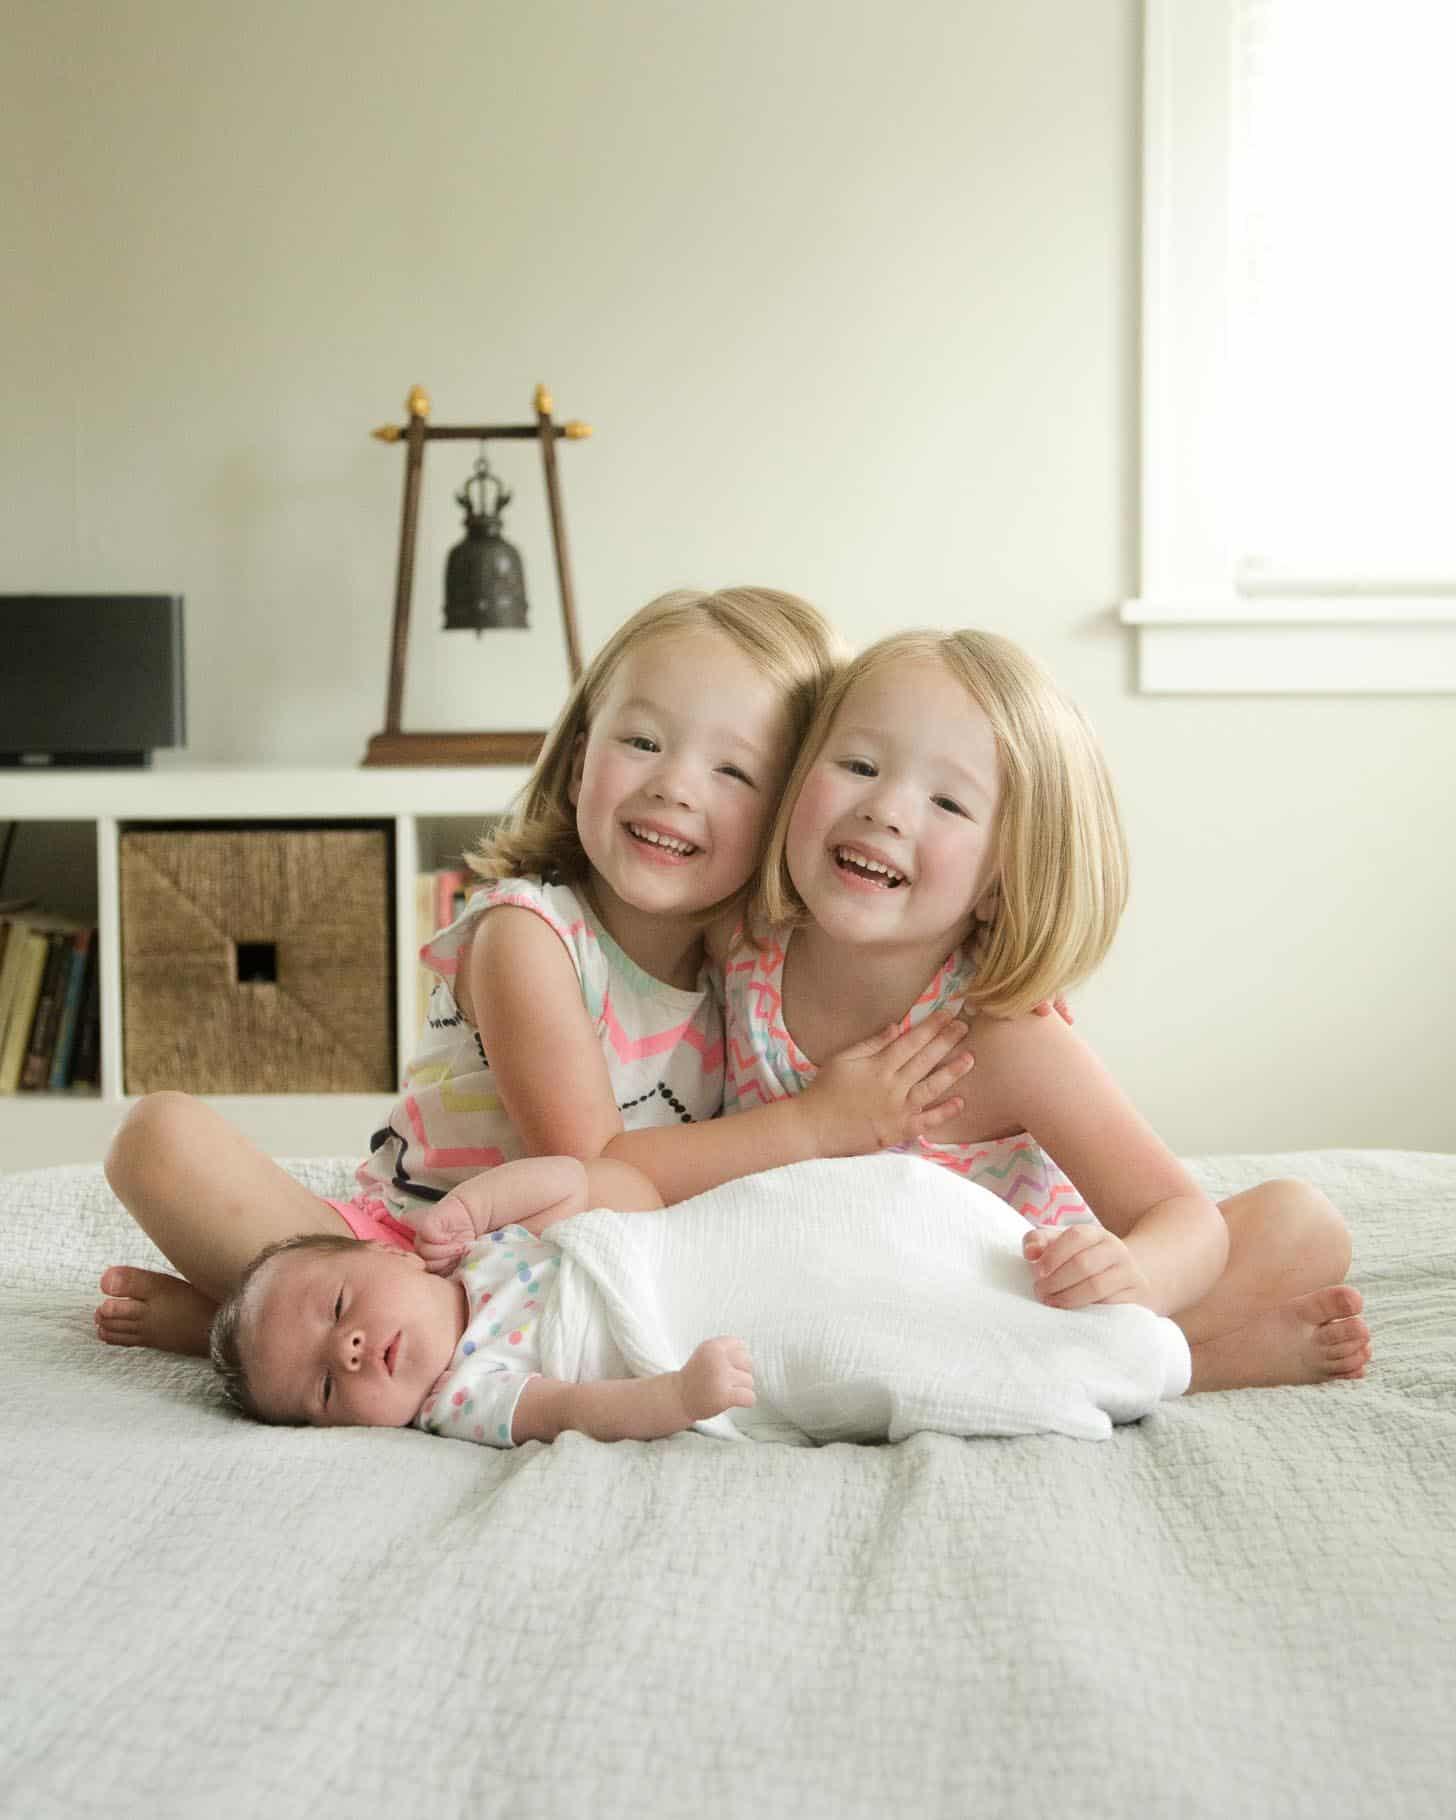 Molly, Clara and baby June